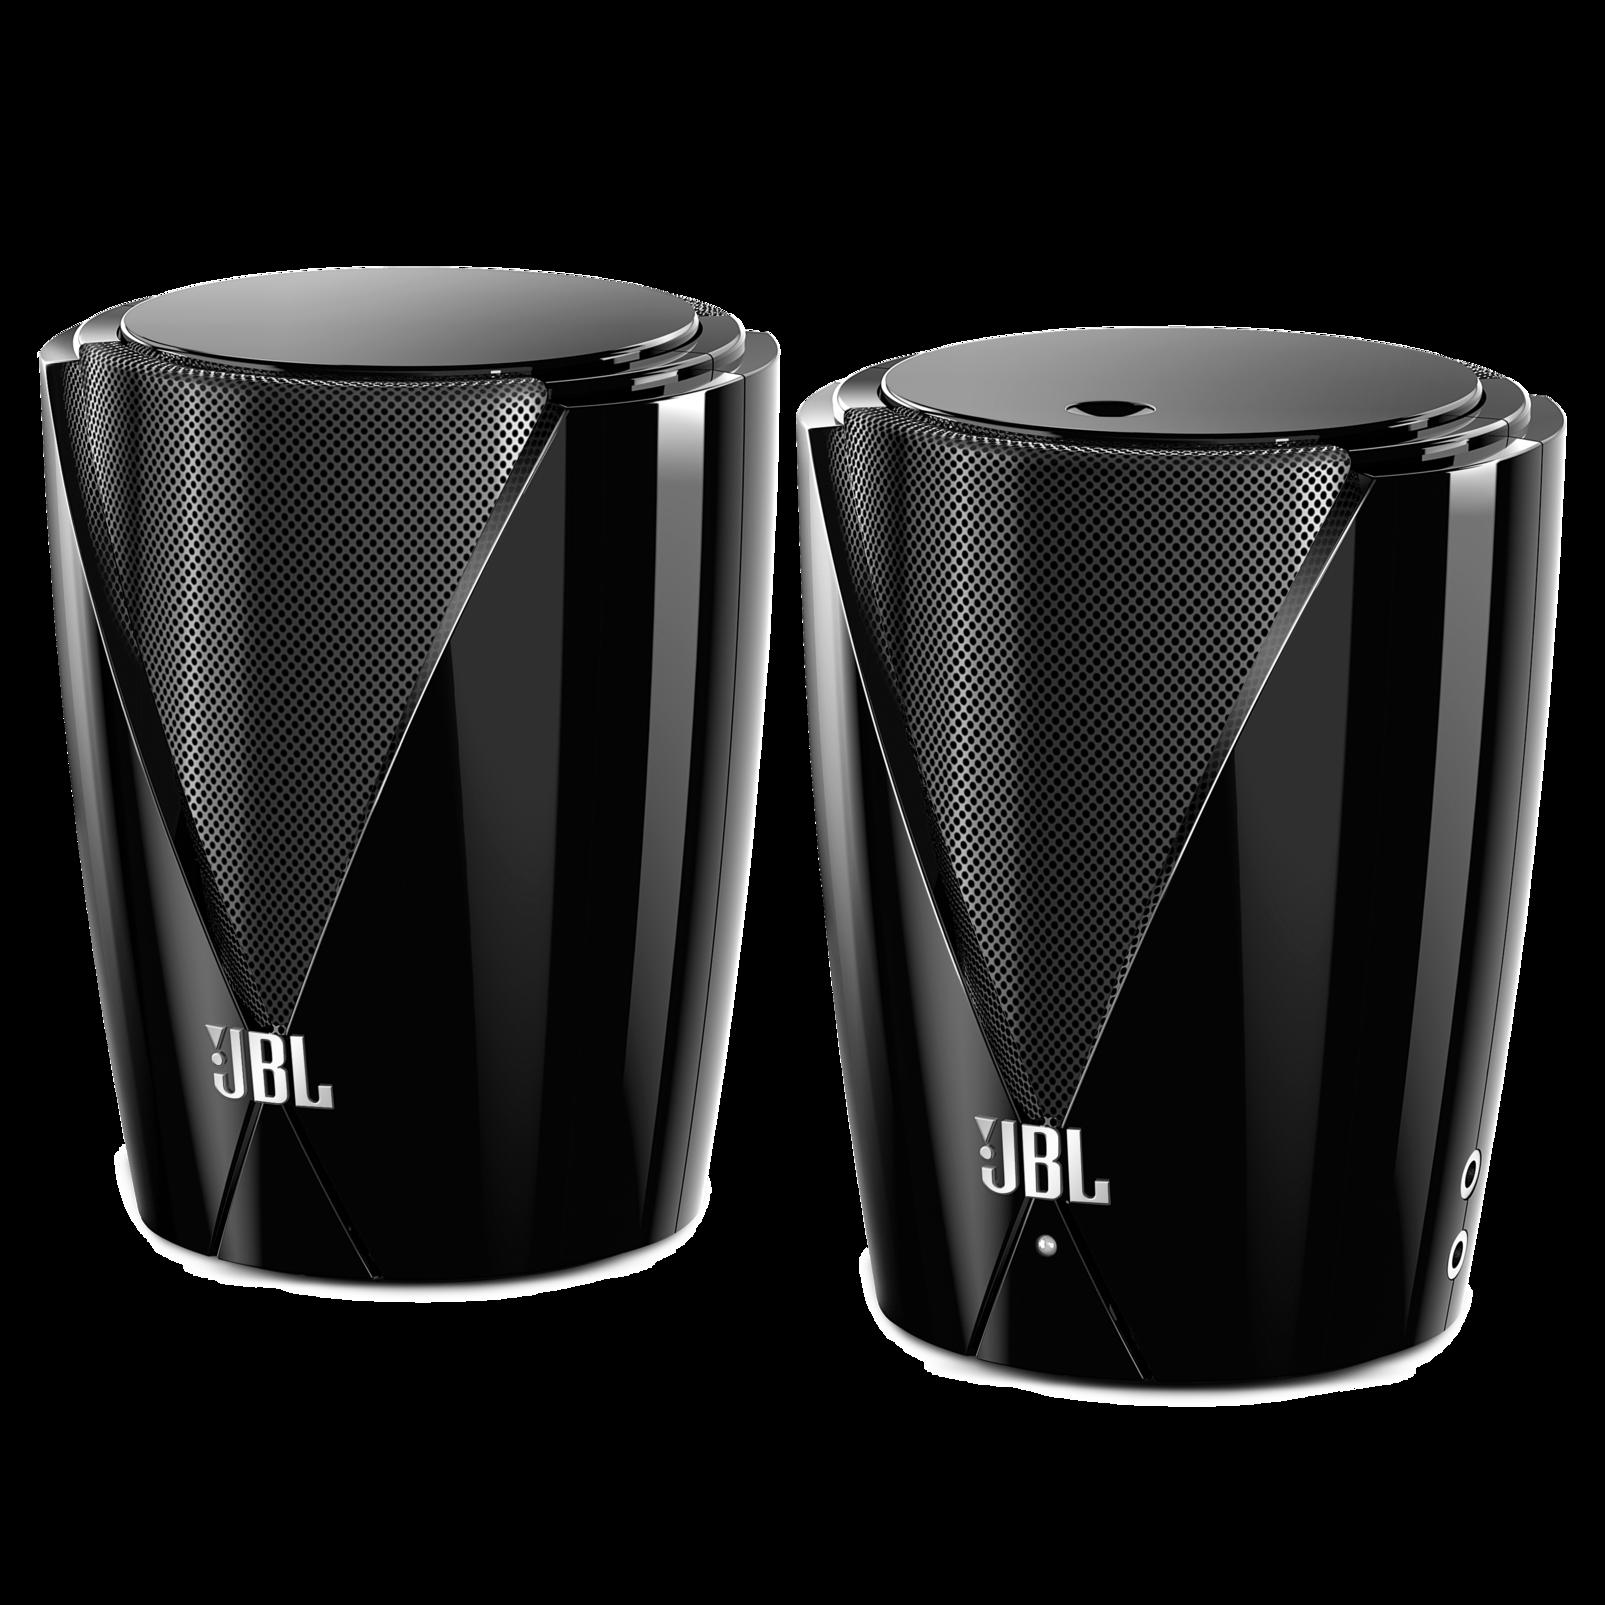 JBL Jembe Powerful Computer Speakers $18 + Free Shipping!